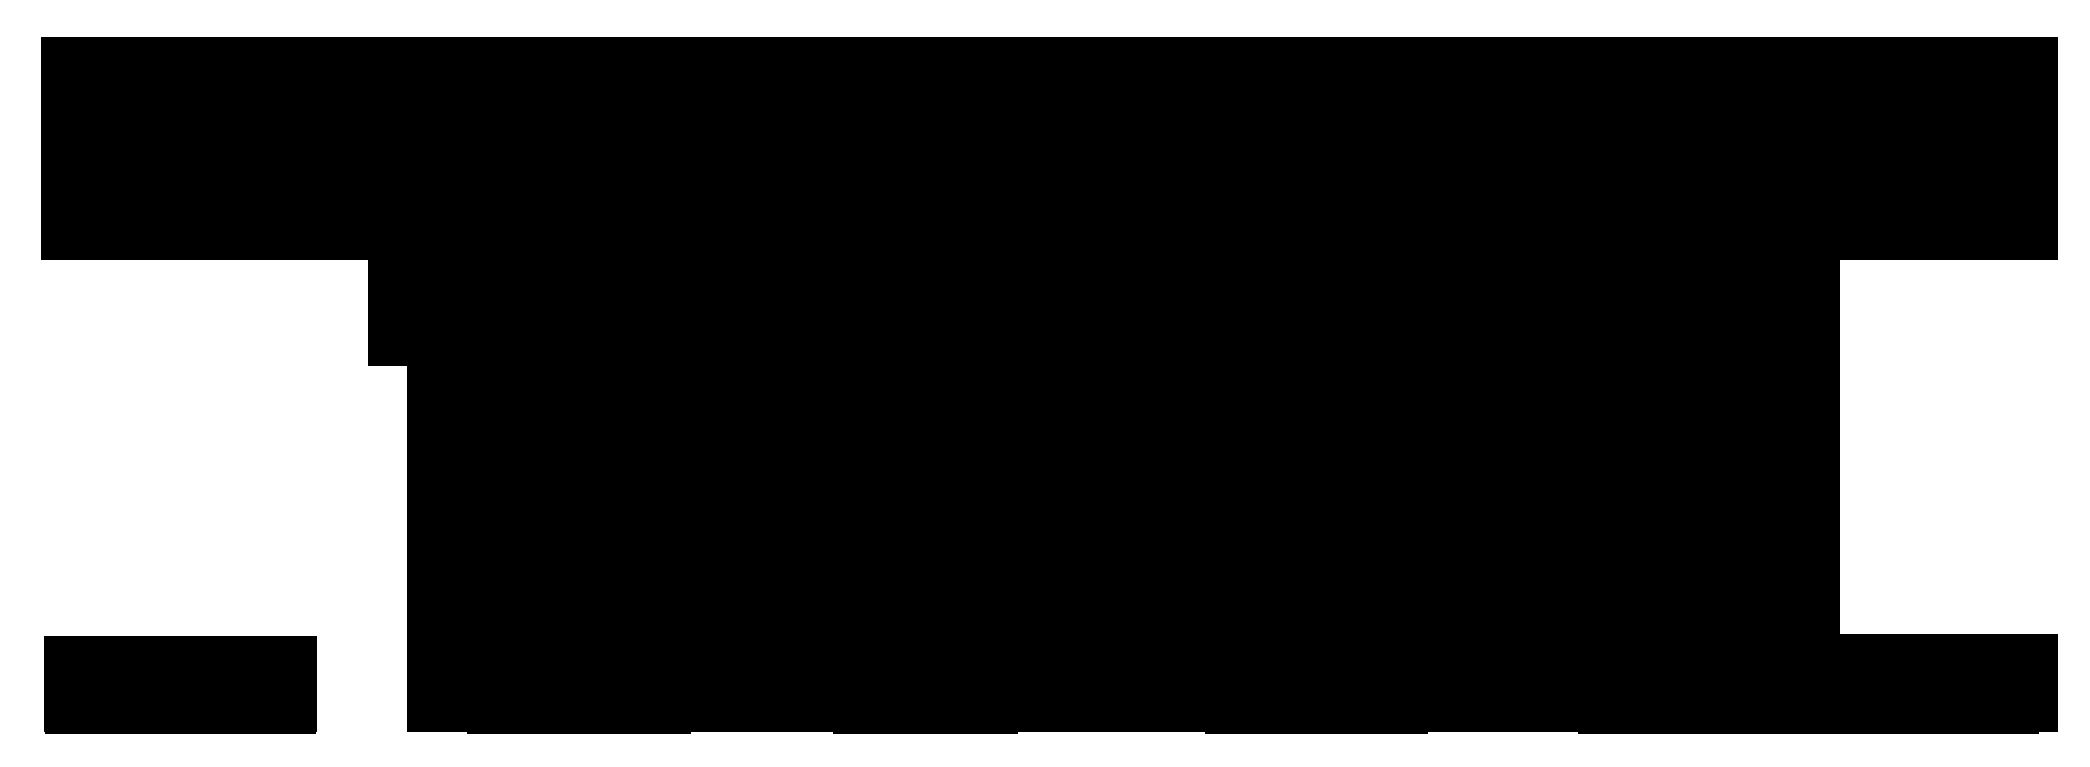 goldsgym logo footer